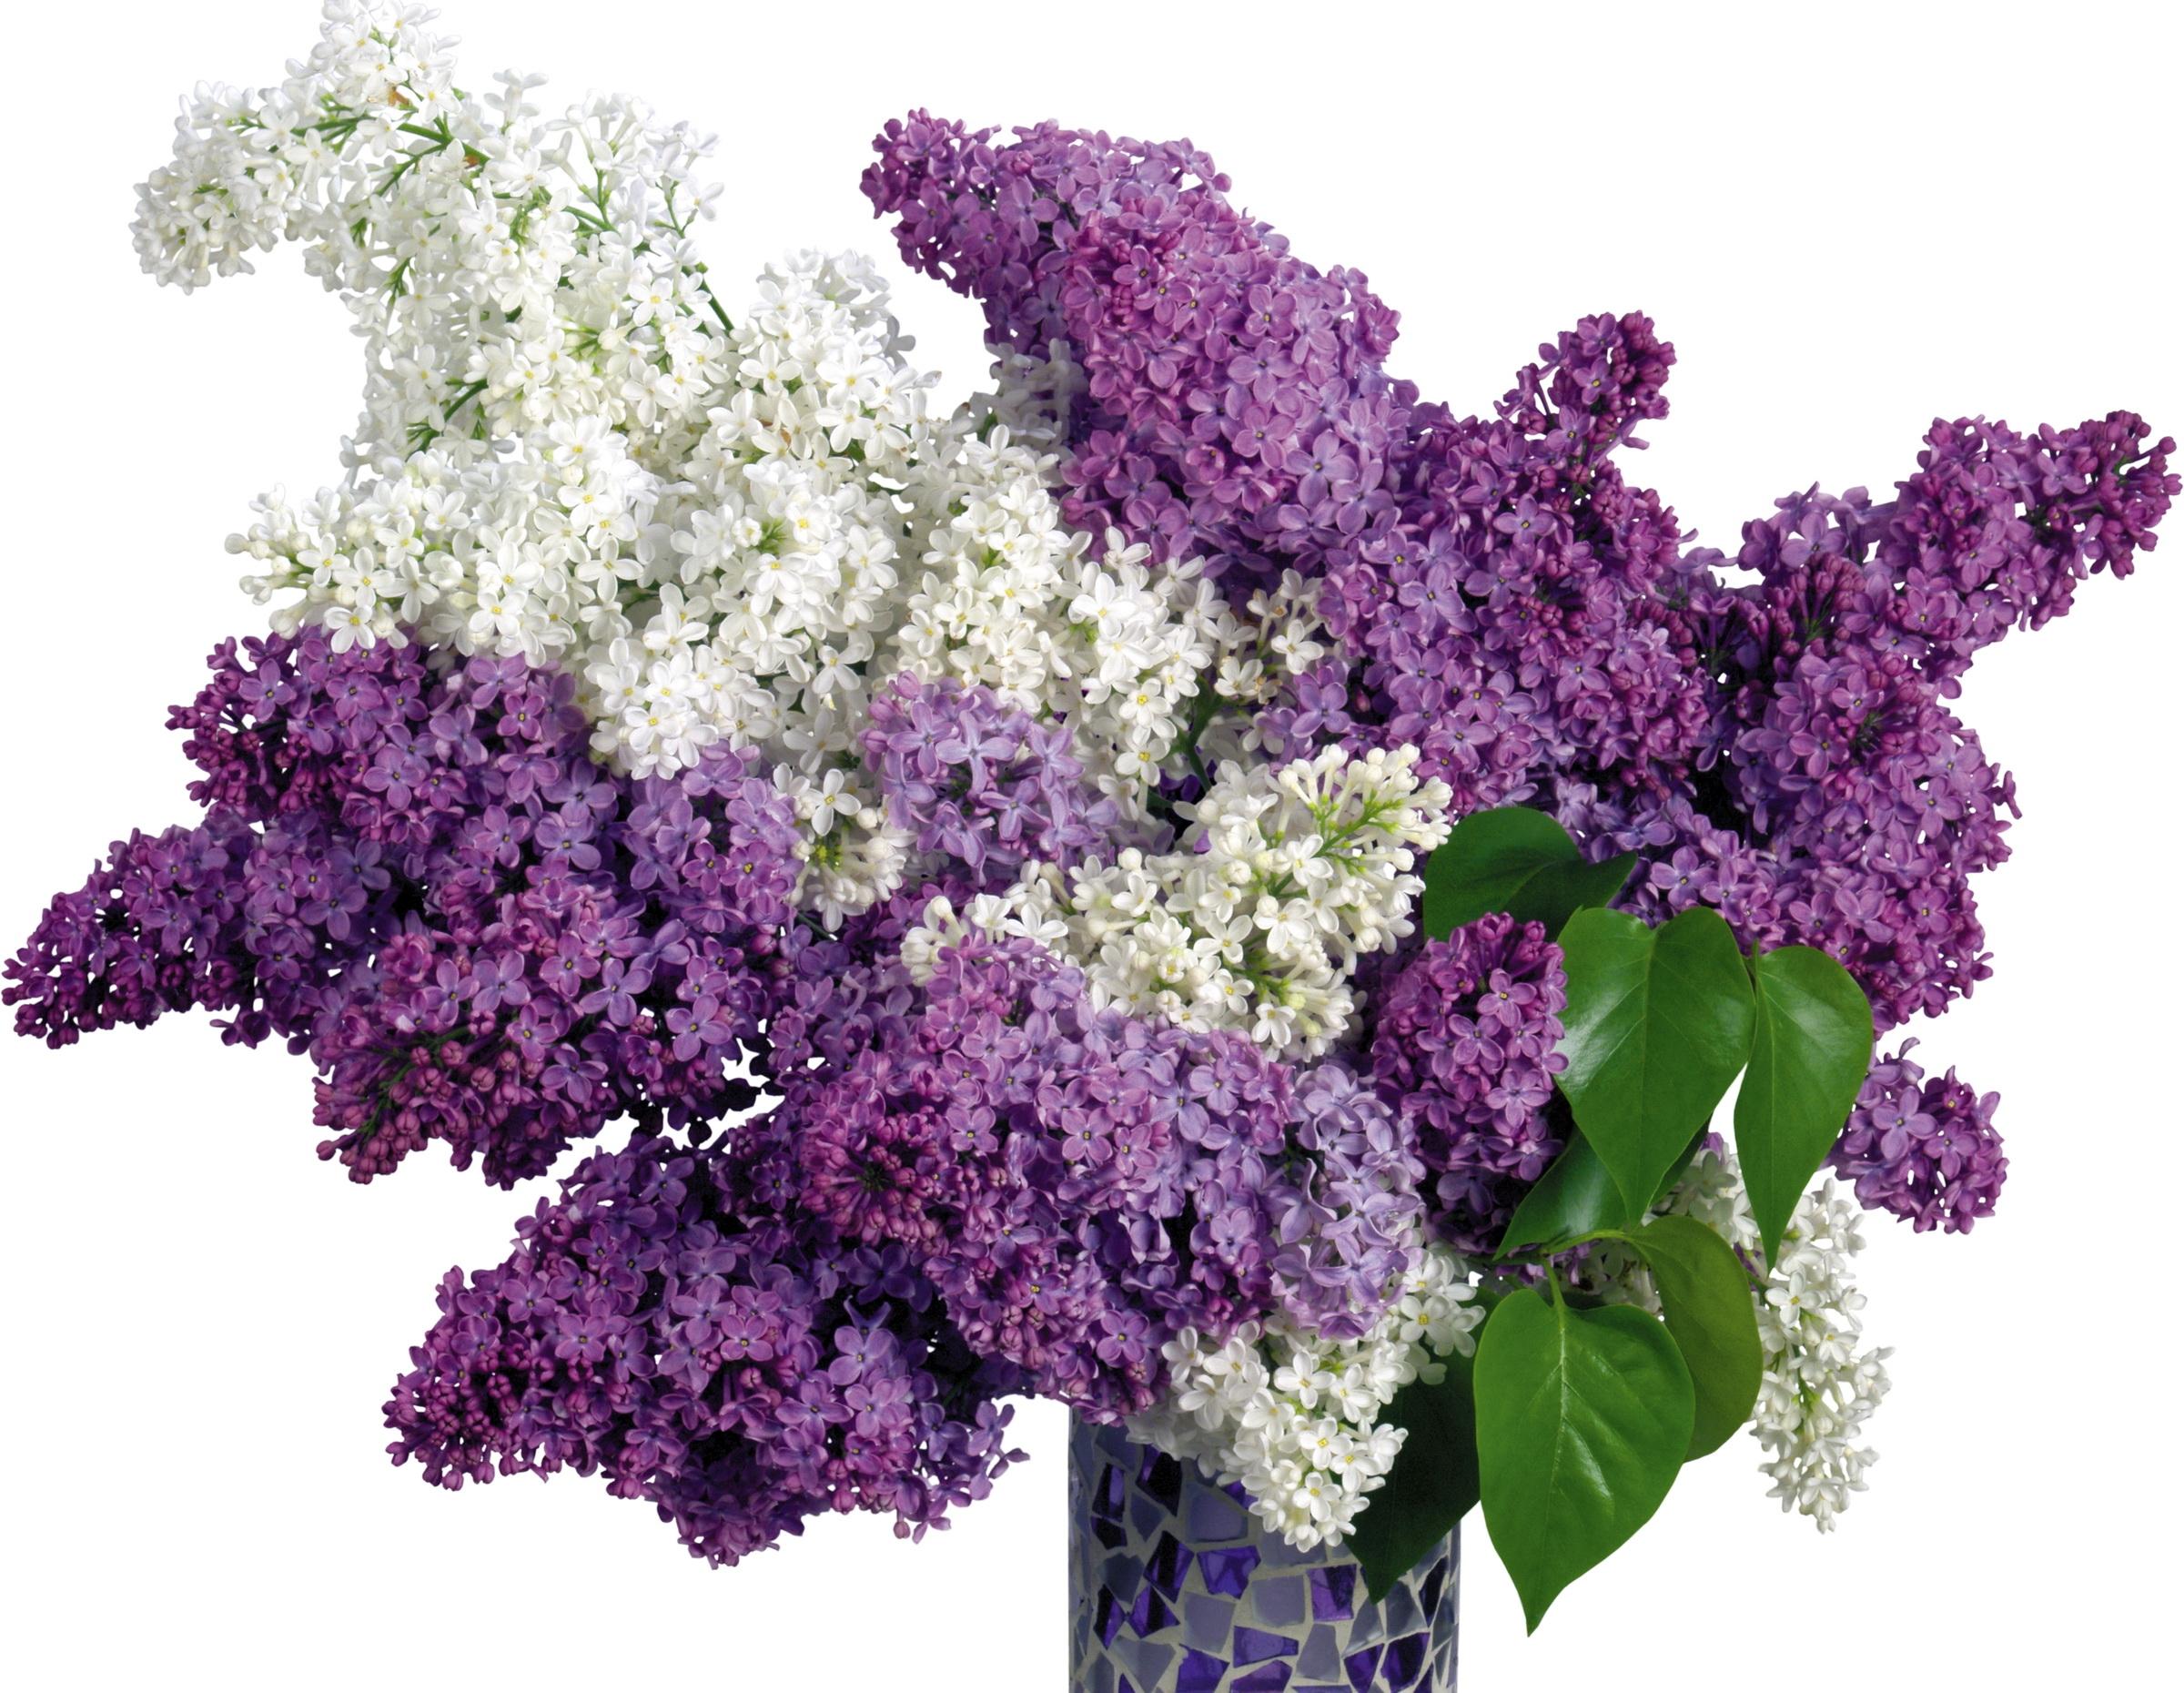 Wallpaper White Purple Branch Blossom Spring Herb Lilac